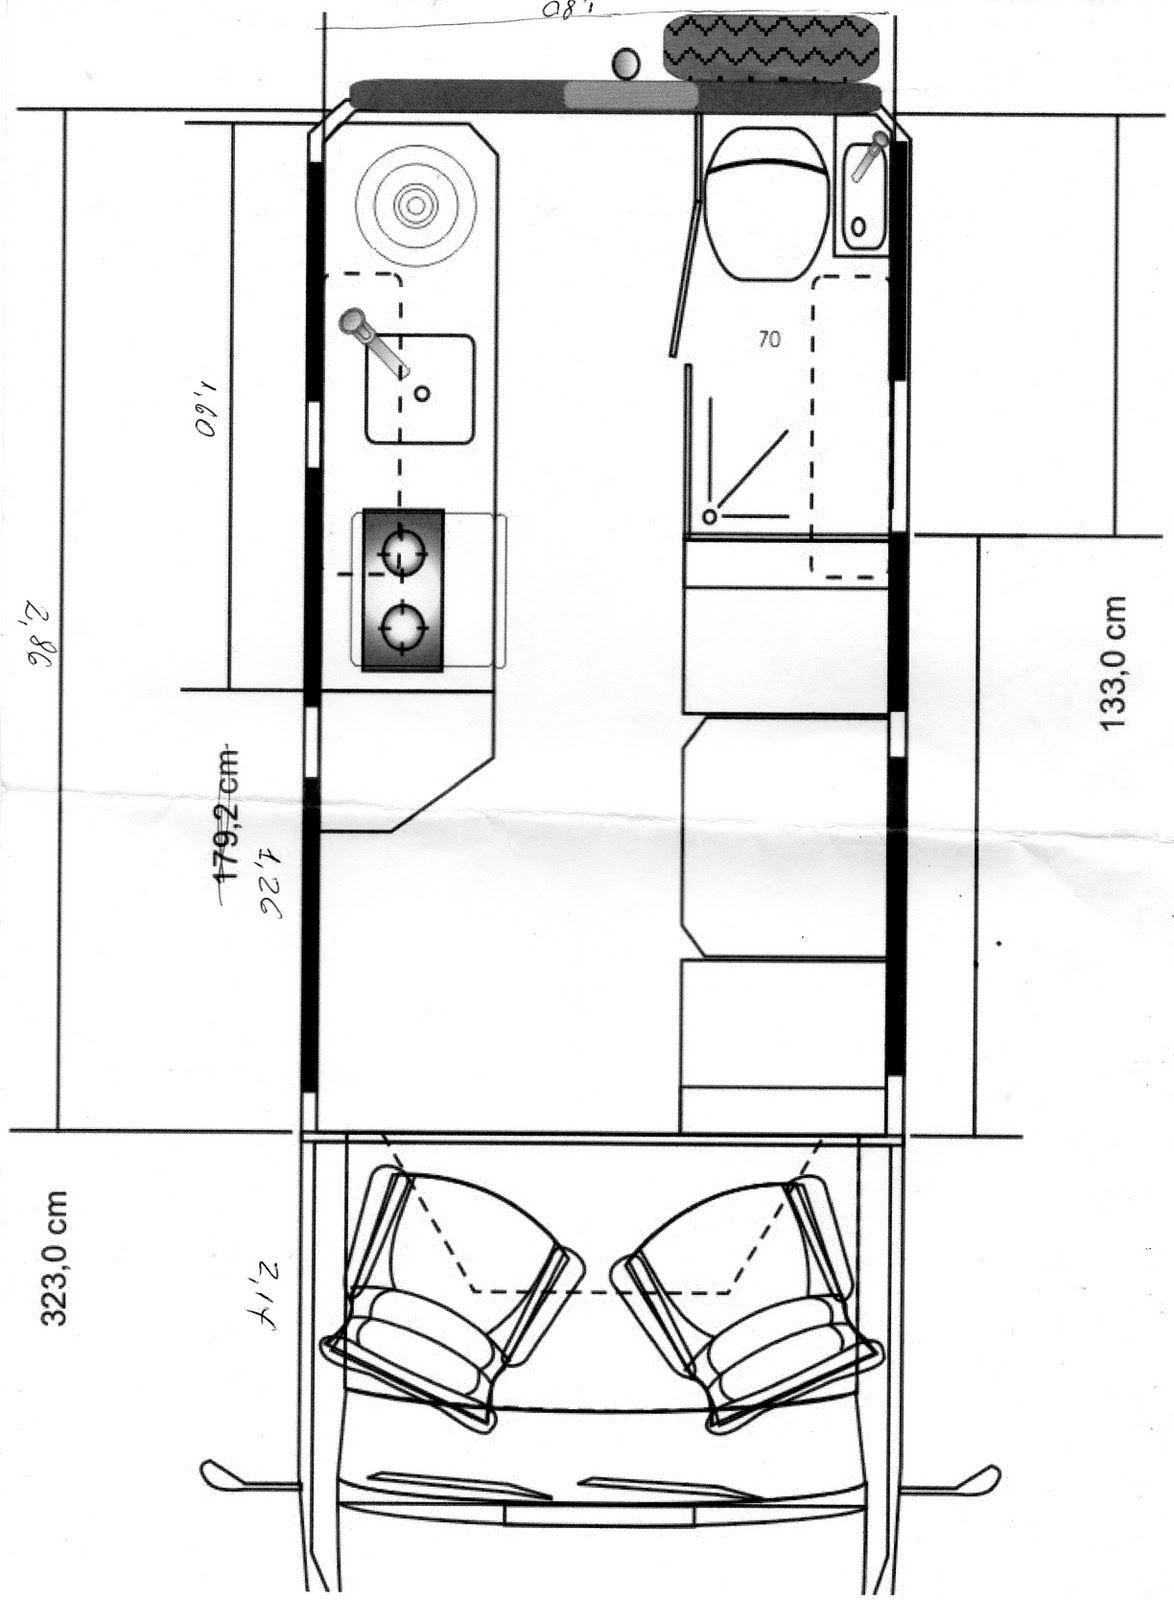 32 Explorer Conversion Van Wiring Diagram